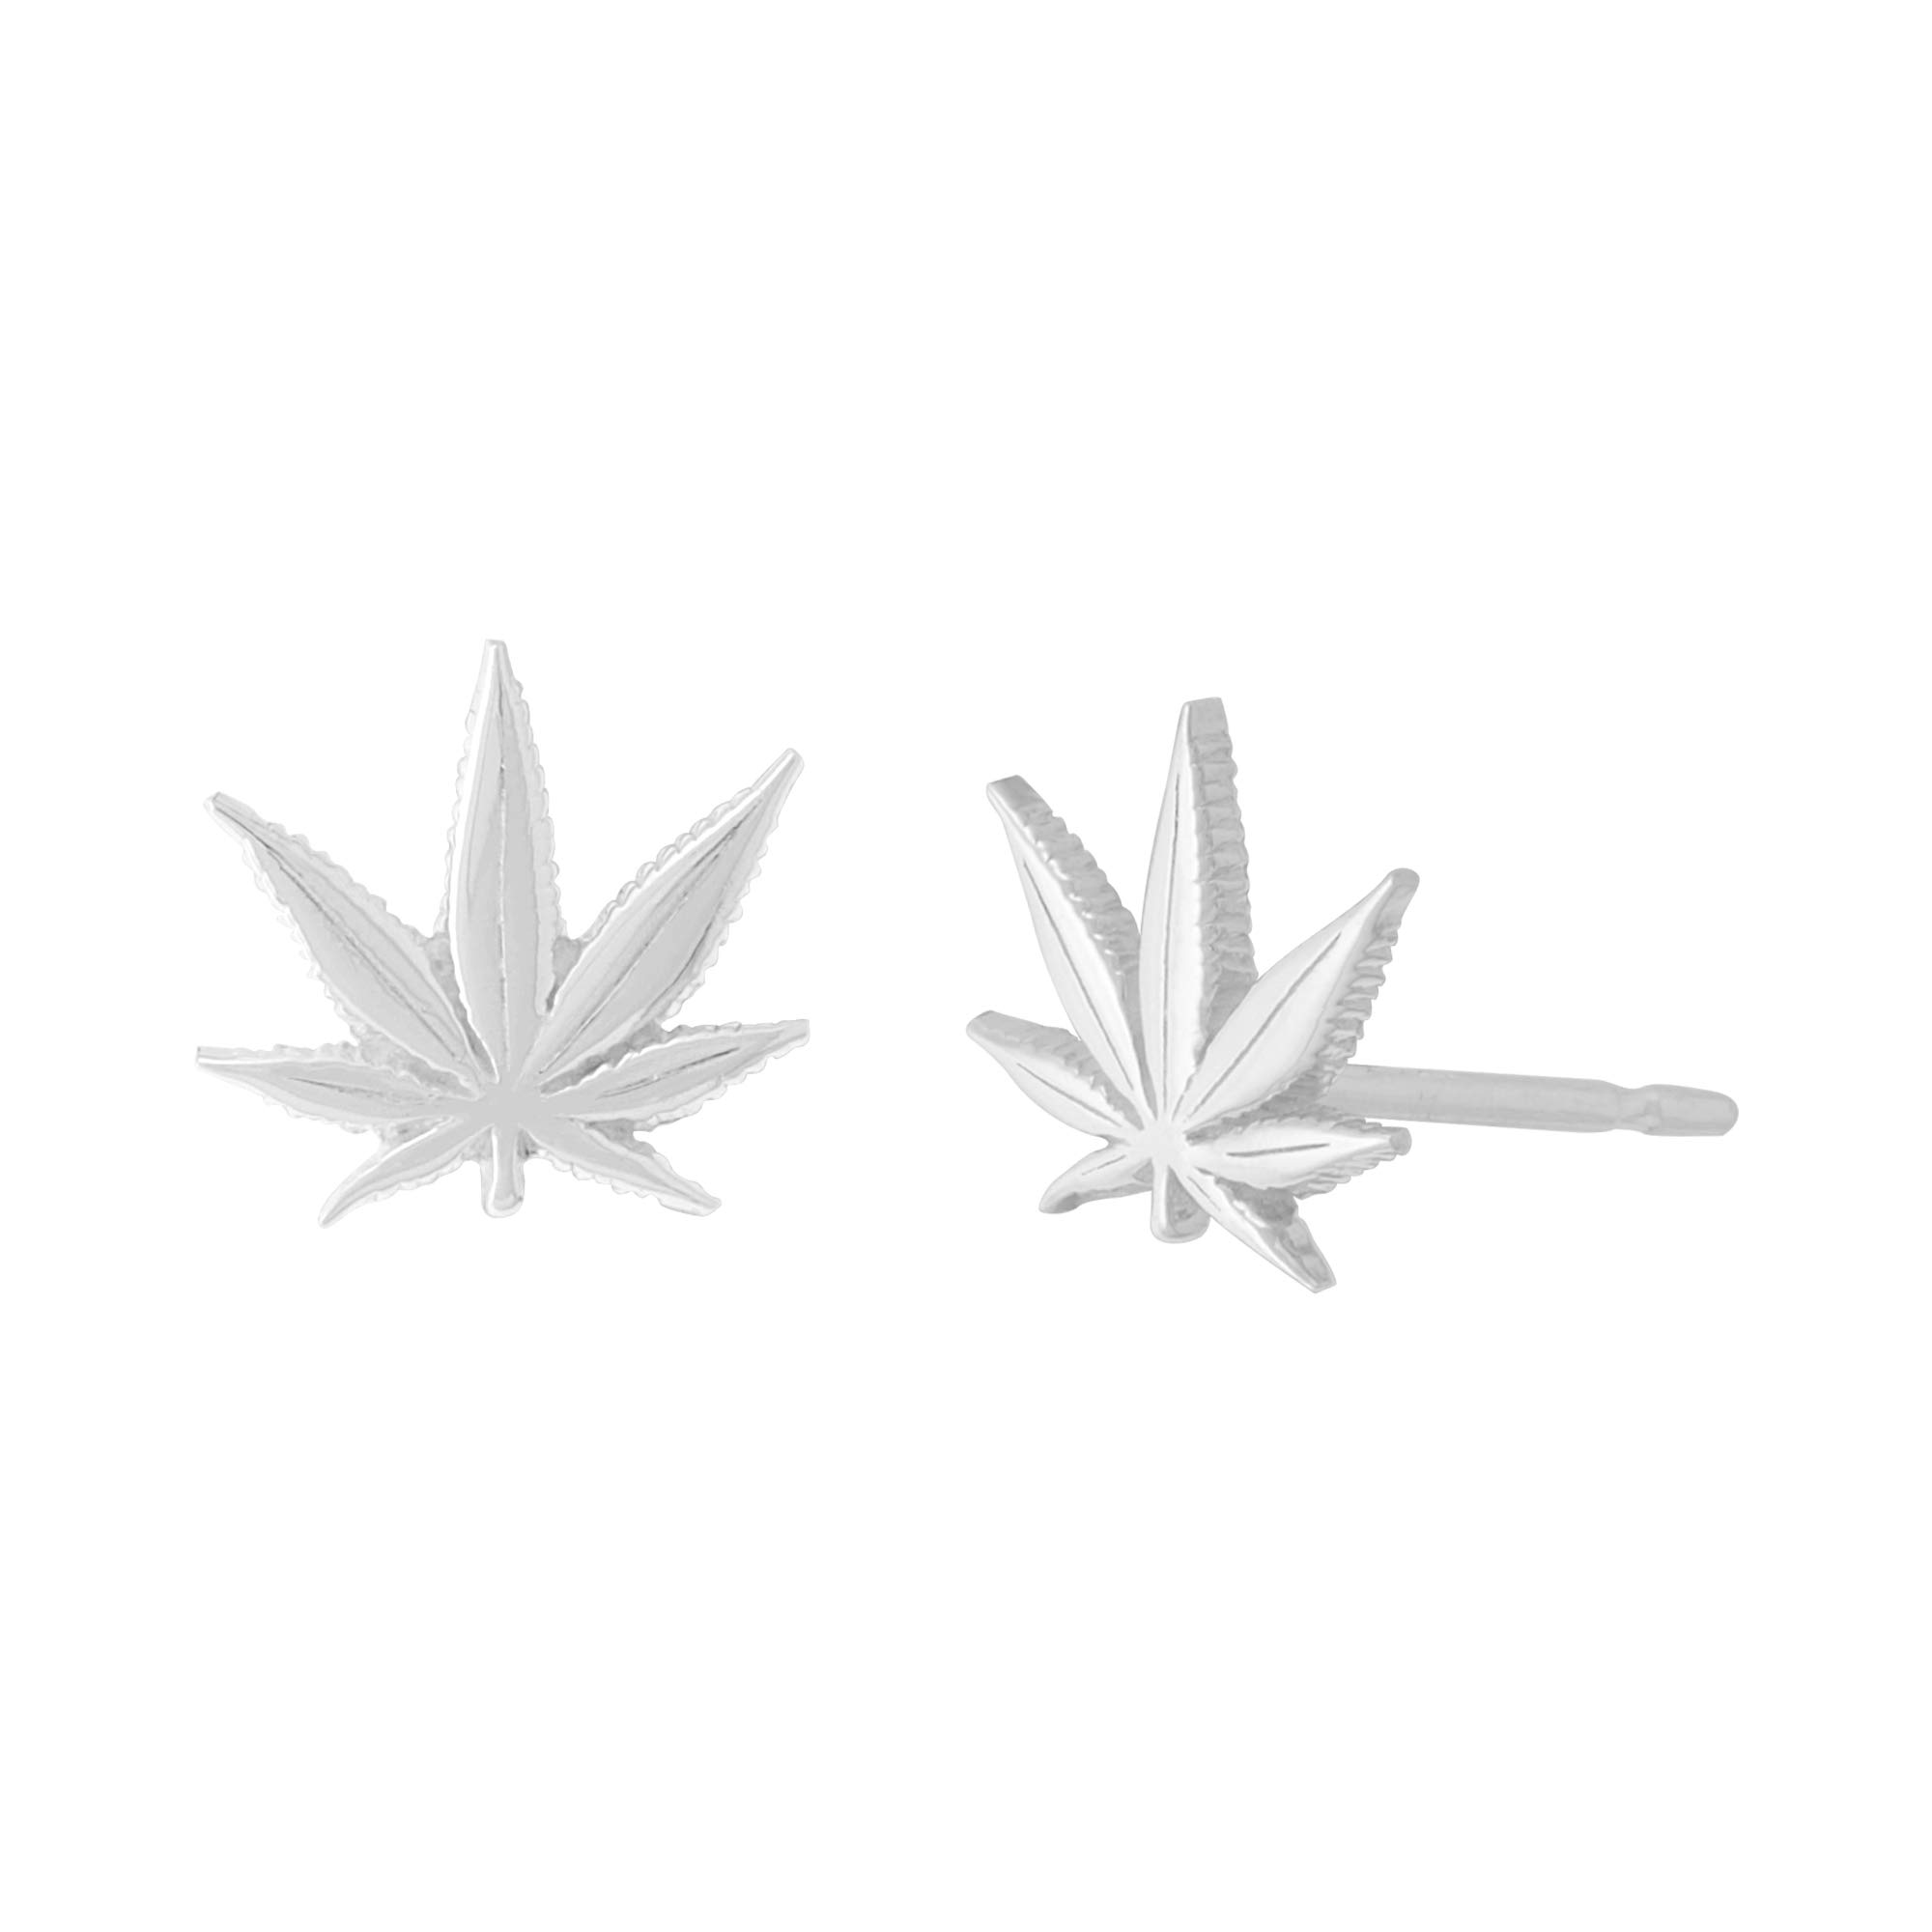 Boma Jewlery Sterling Silver Marijuana Pot Weed Cannabis Leaf Stud Earrings